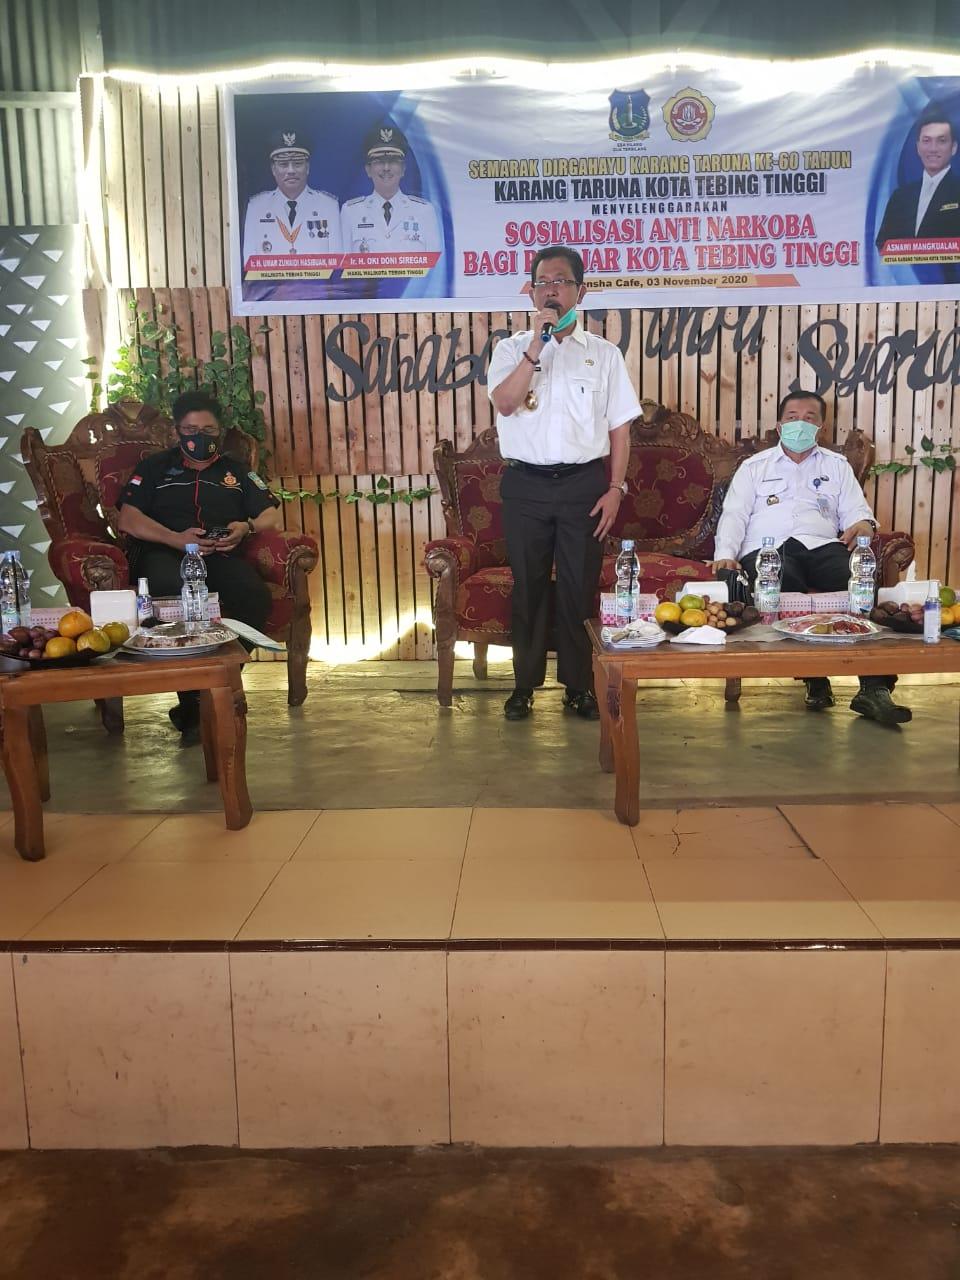 Wakil Walikota Tebing Tenggi Membuka Sosialisasi Anti Narkoba